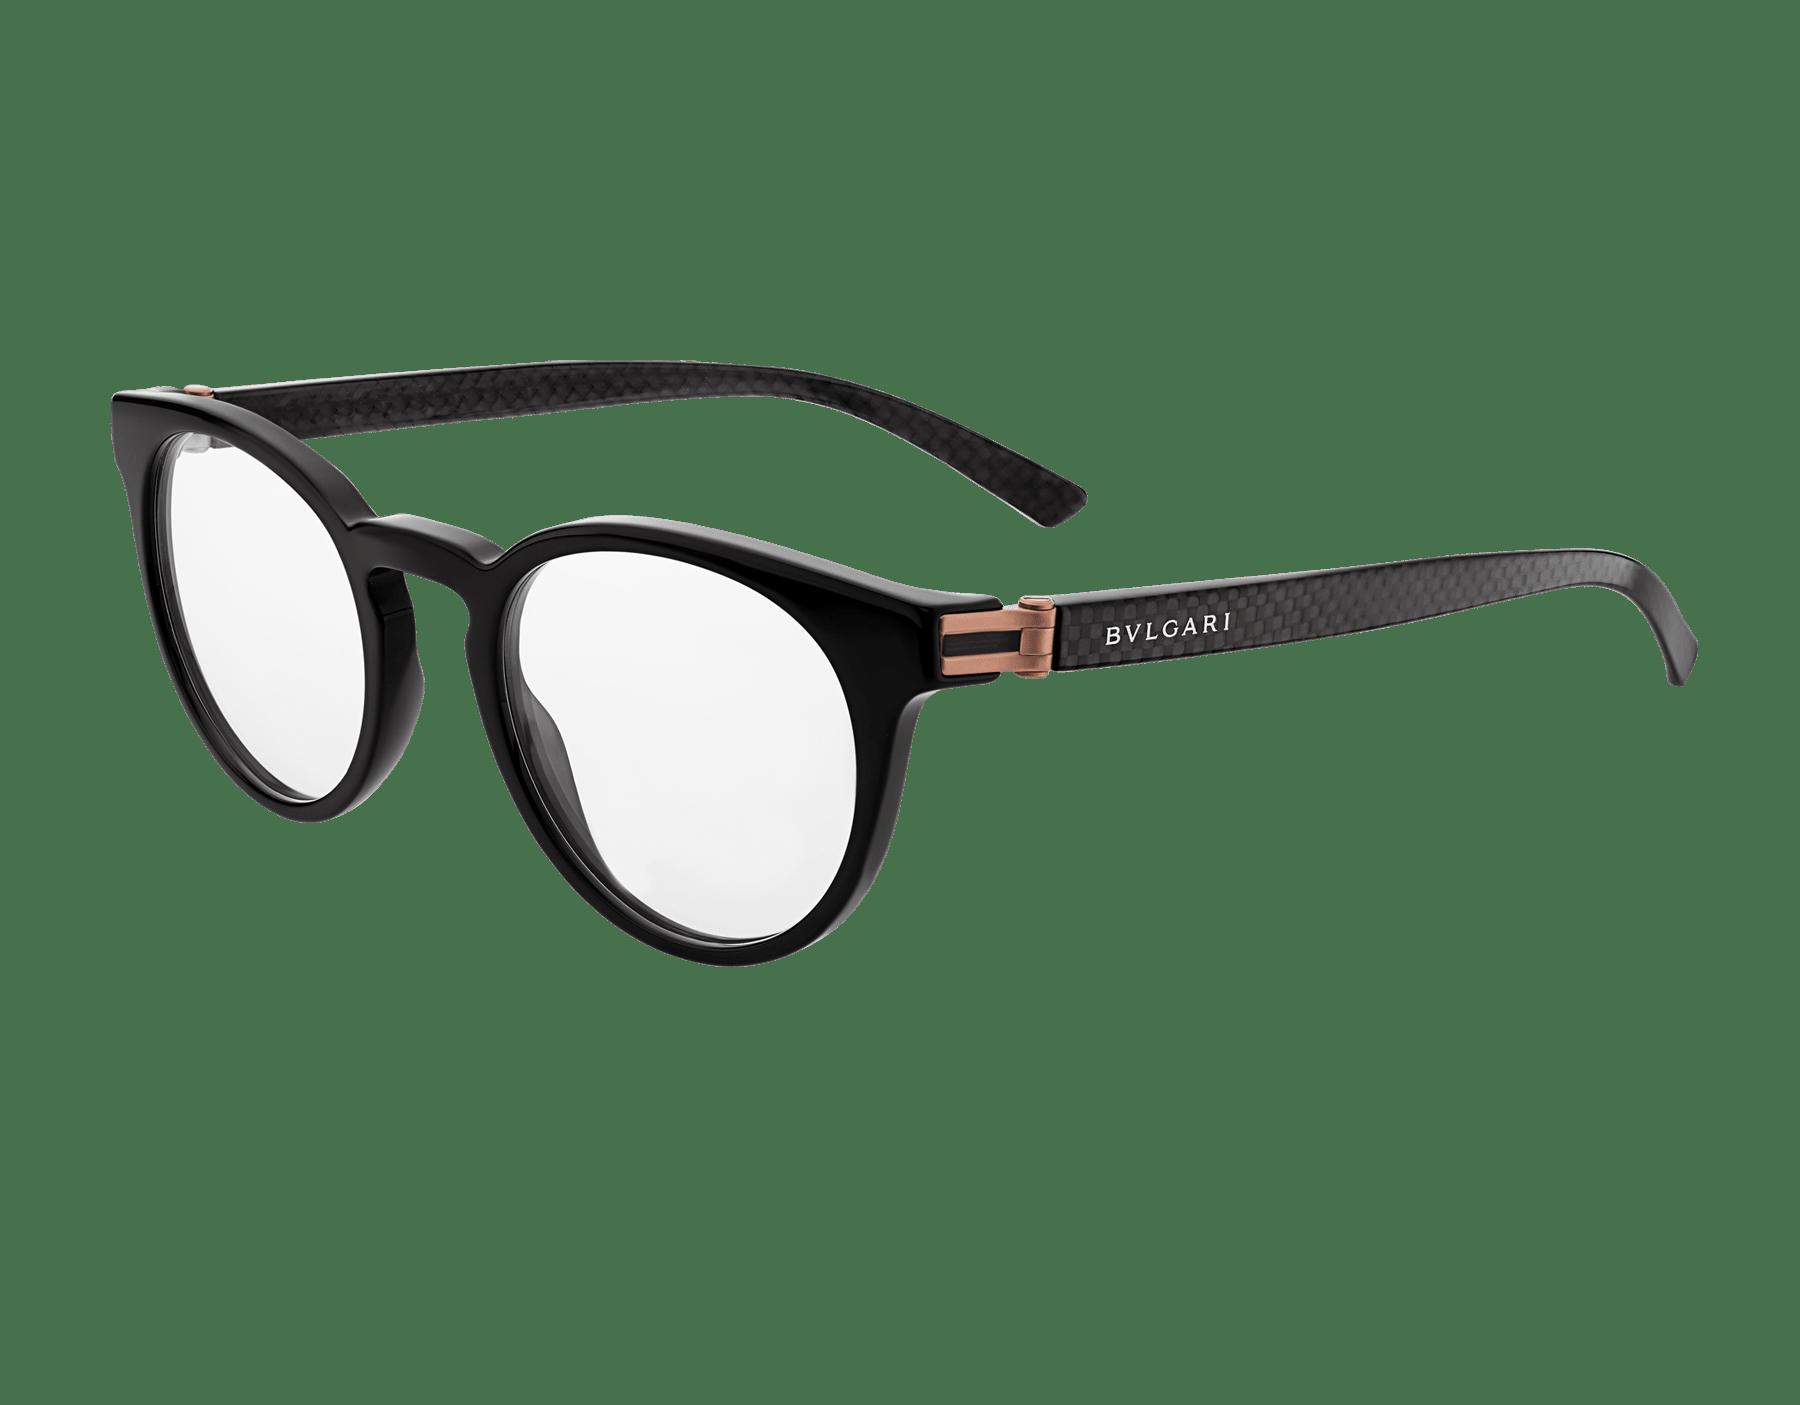 Óculos redondos Bvlgari Diagono em acetato. 903923 image 1